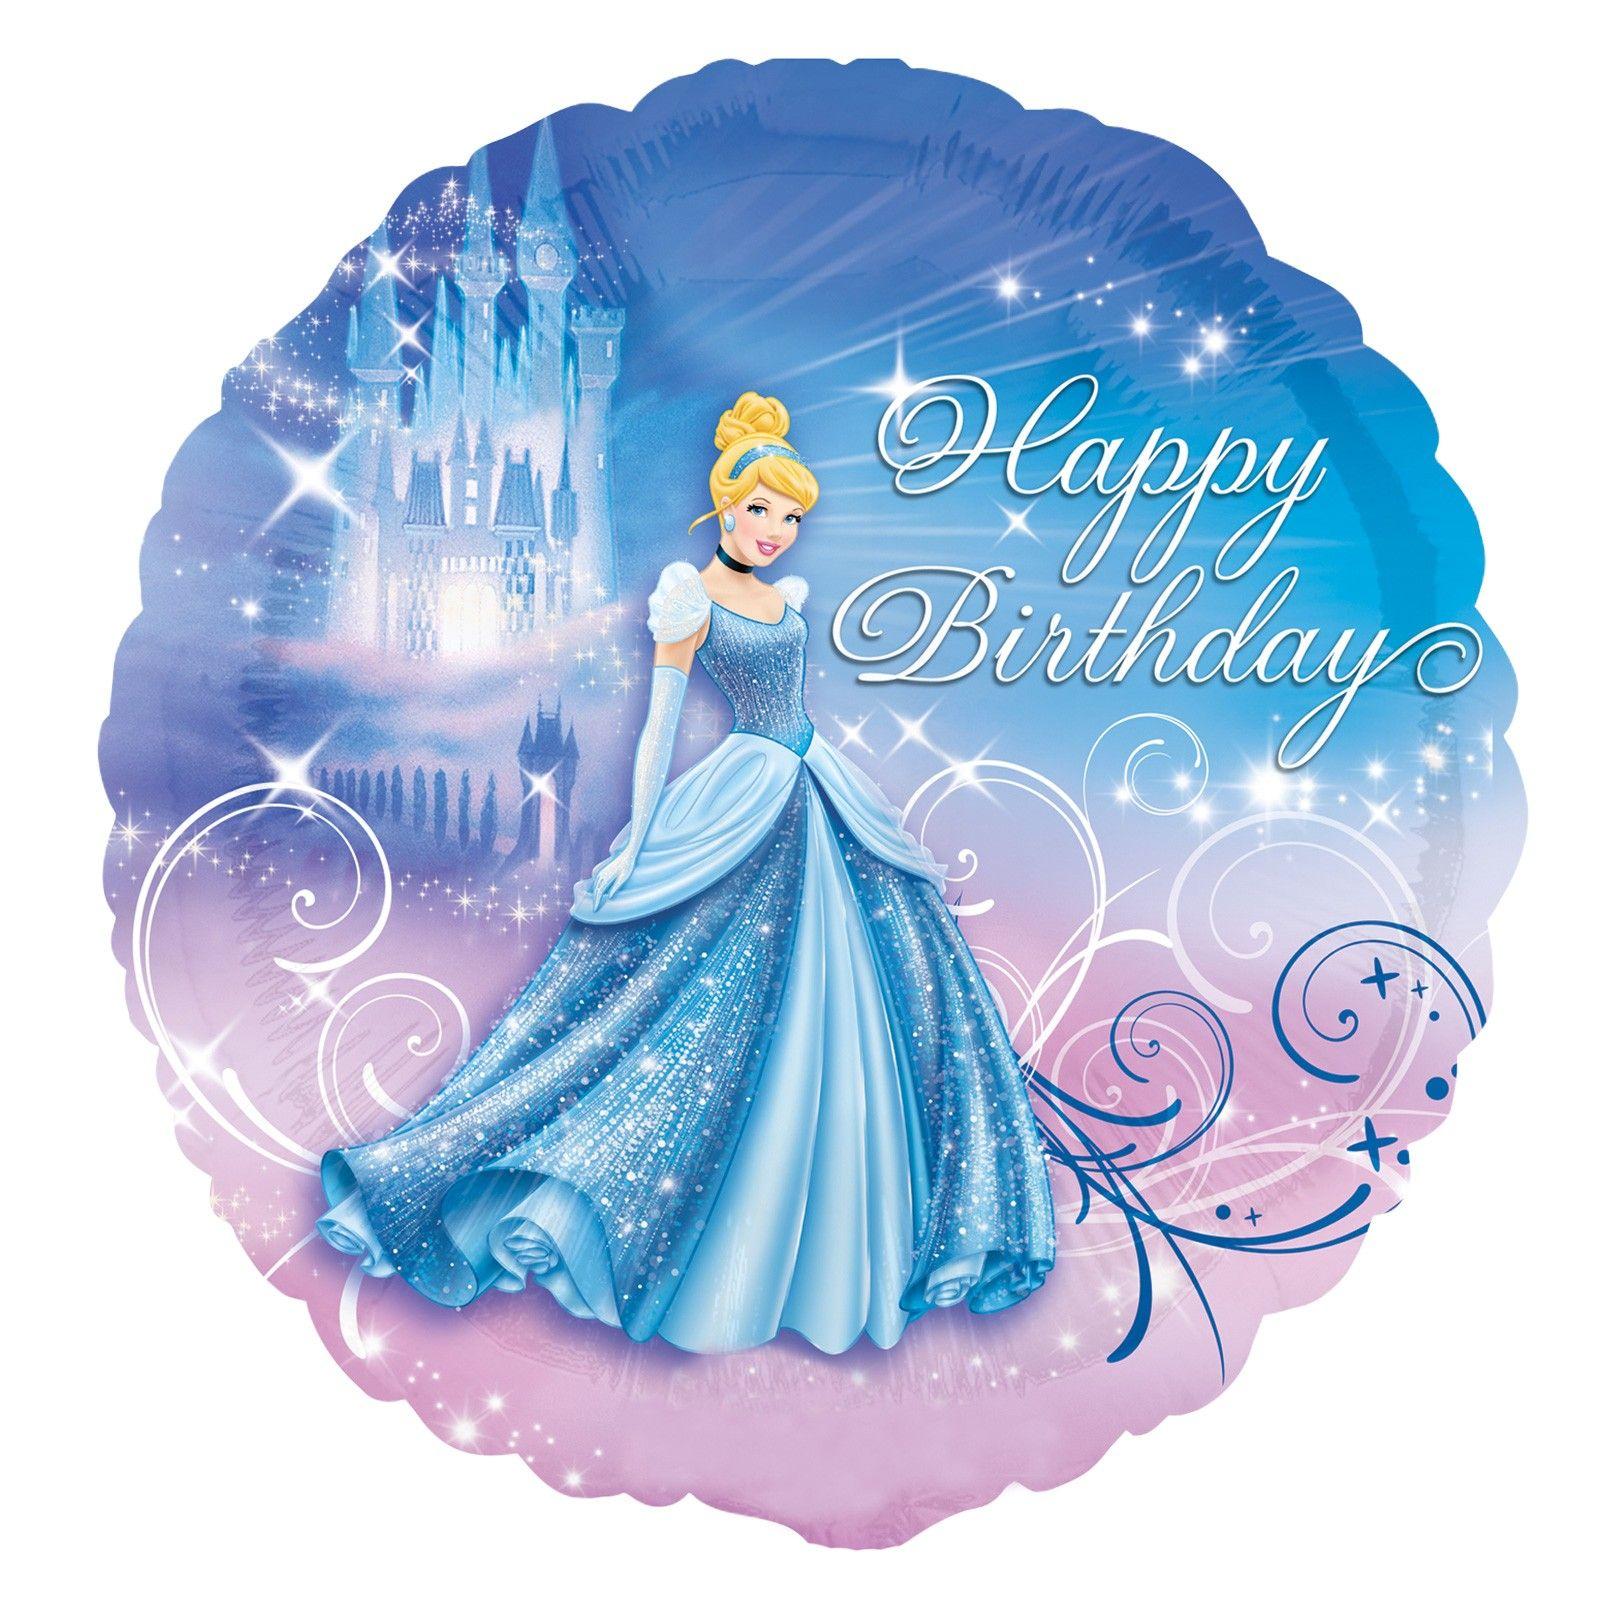 happy birthday Happy birthday foil balloons, Cinderella